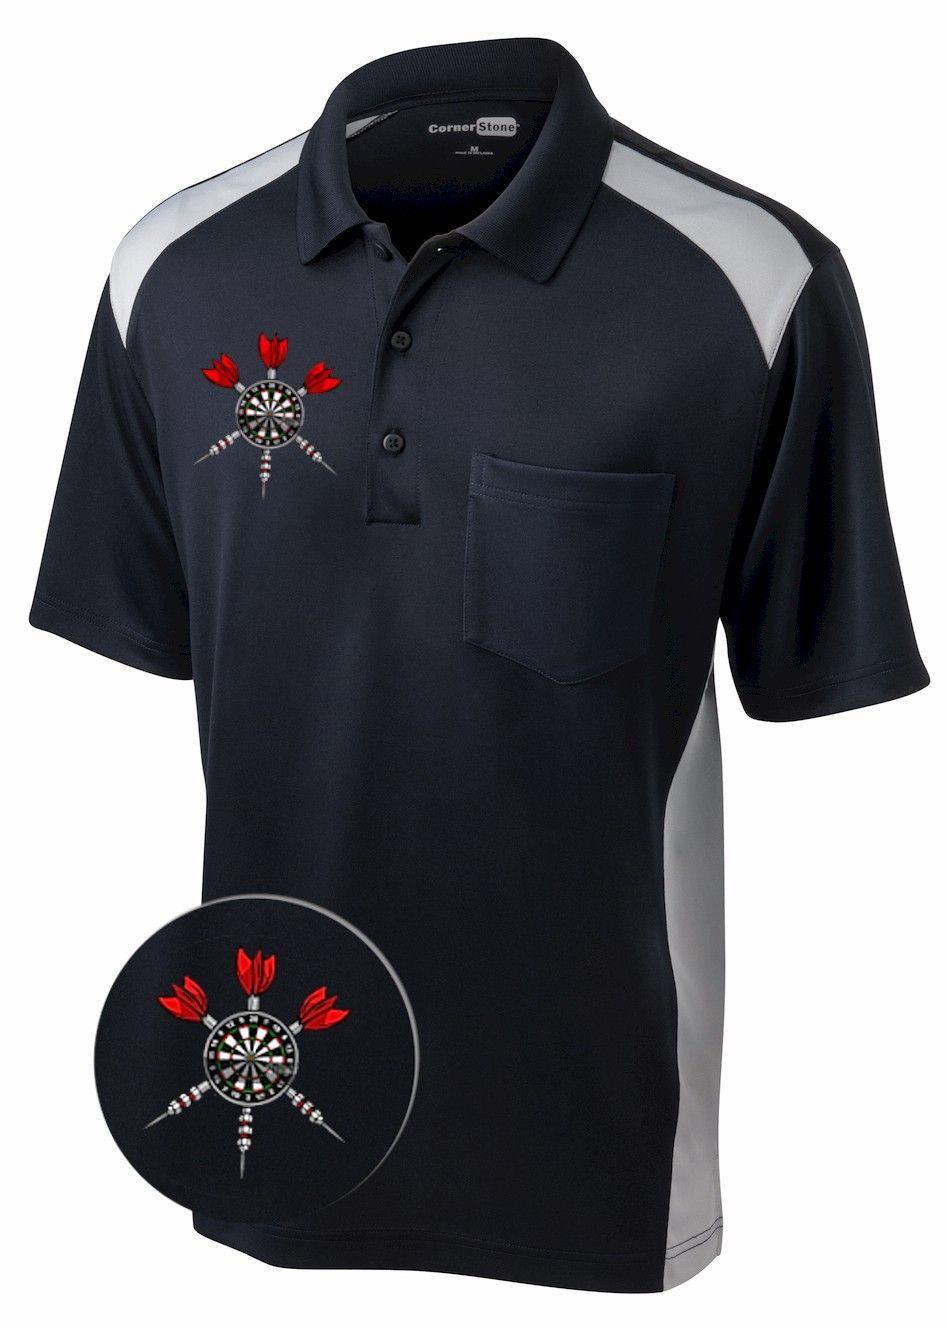 Bullseye Performance Pocket Darts Shirt Bowling Shirts